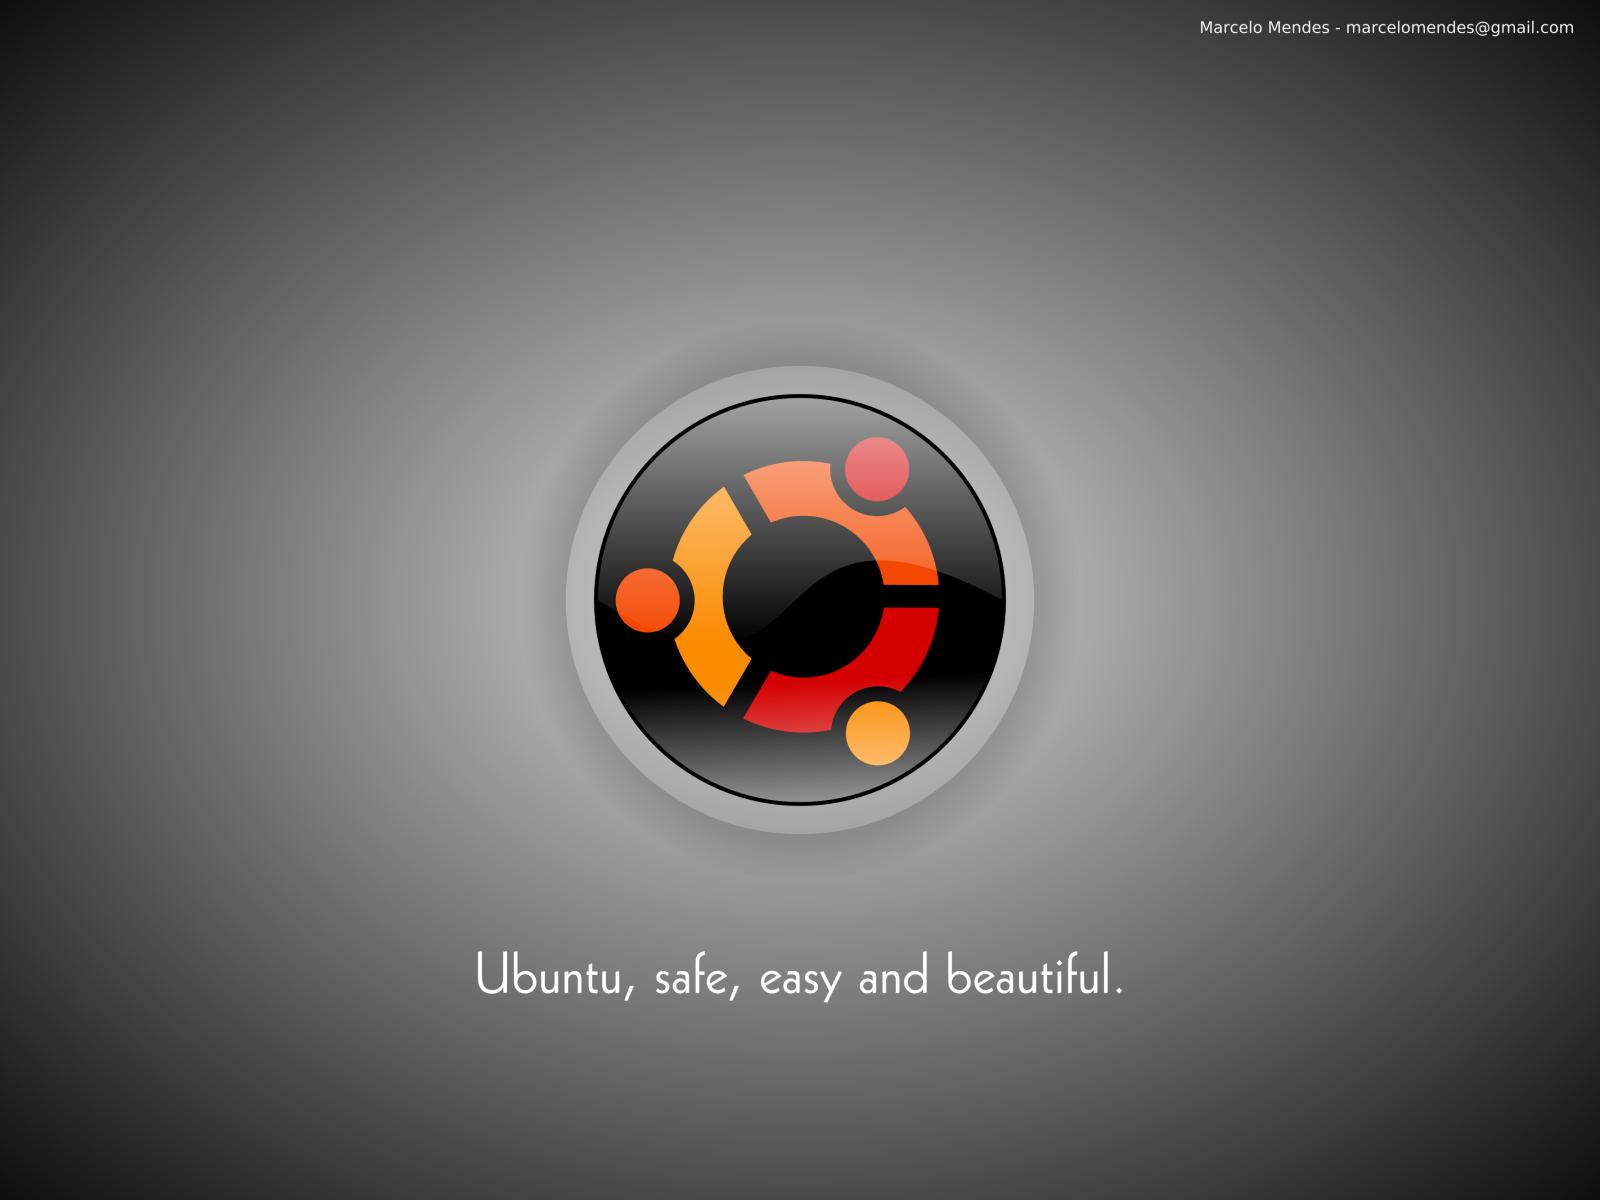 http://3.bp.blogspot.com/_bYvbyQzKRFs/SweLK4fqXZI/AAAAAAAAARM/cBa3IHRJyp4/s1600/ubuntu-wallpaper-easy.png